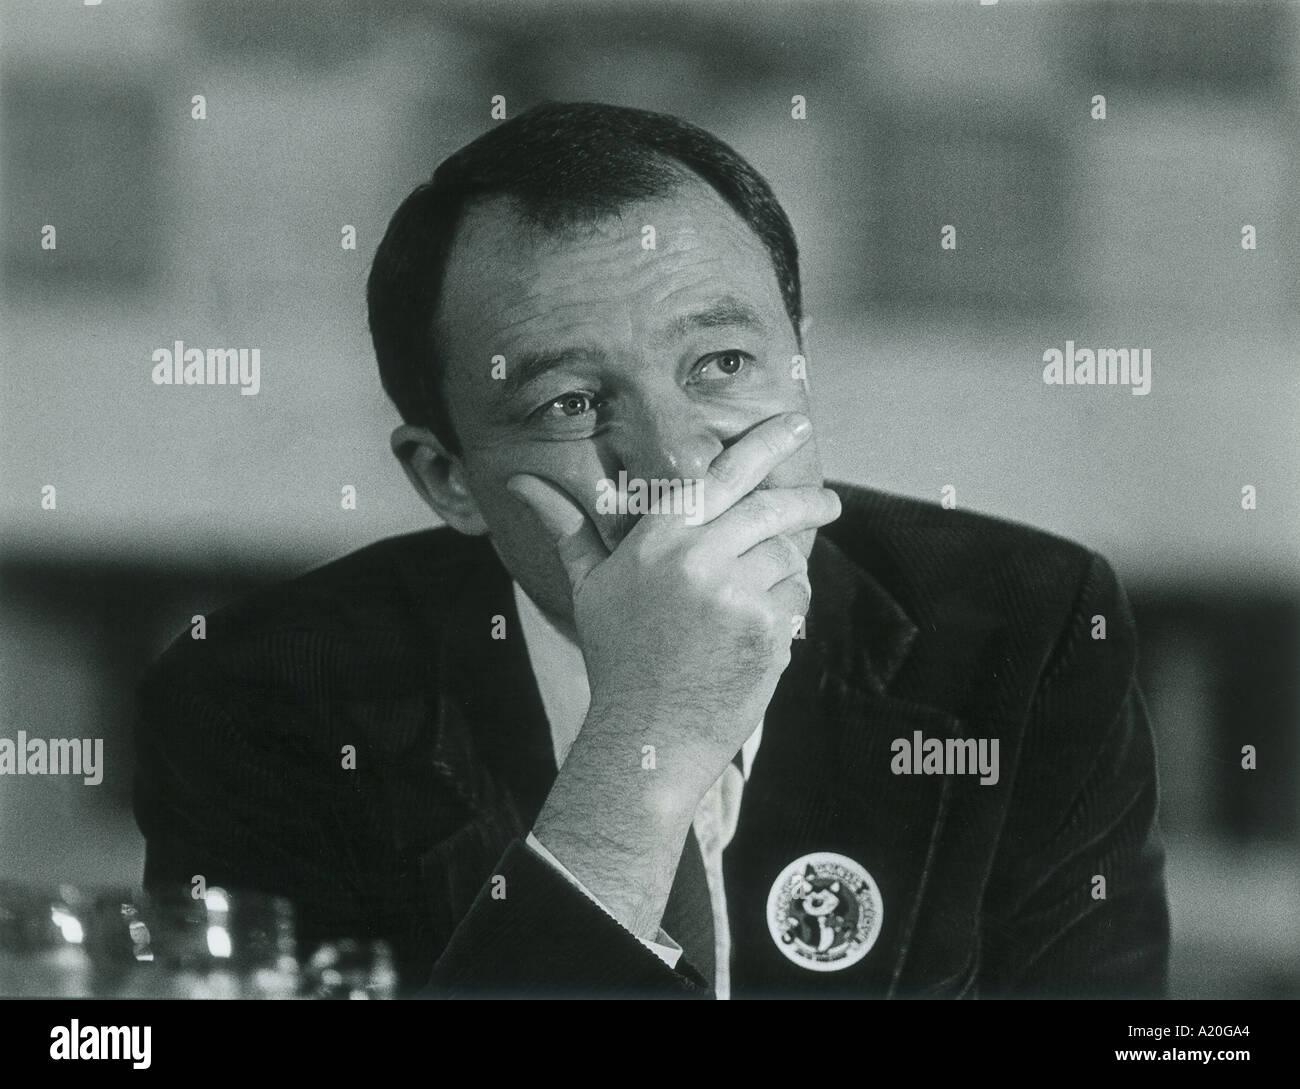 Ken Livingstone Mayor of London and former leader of the GLC. - Stock Image